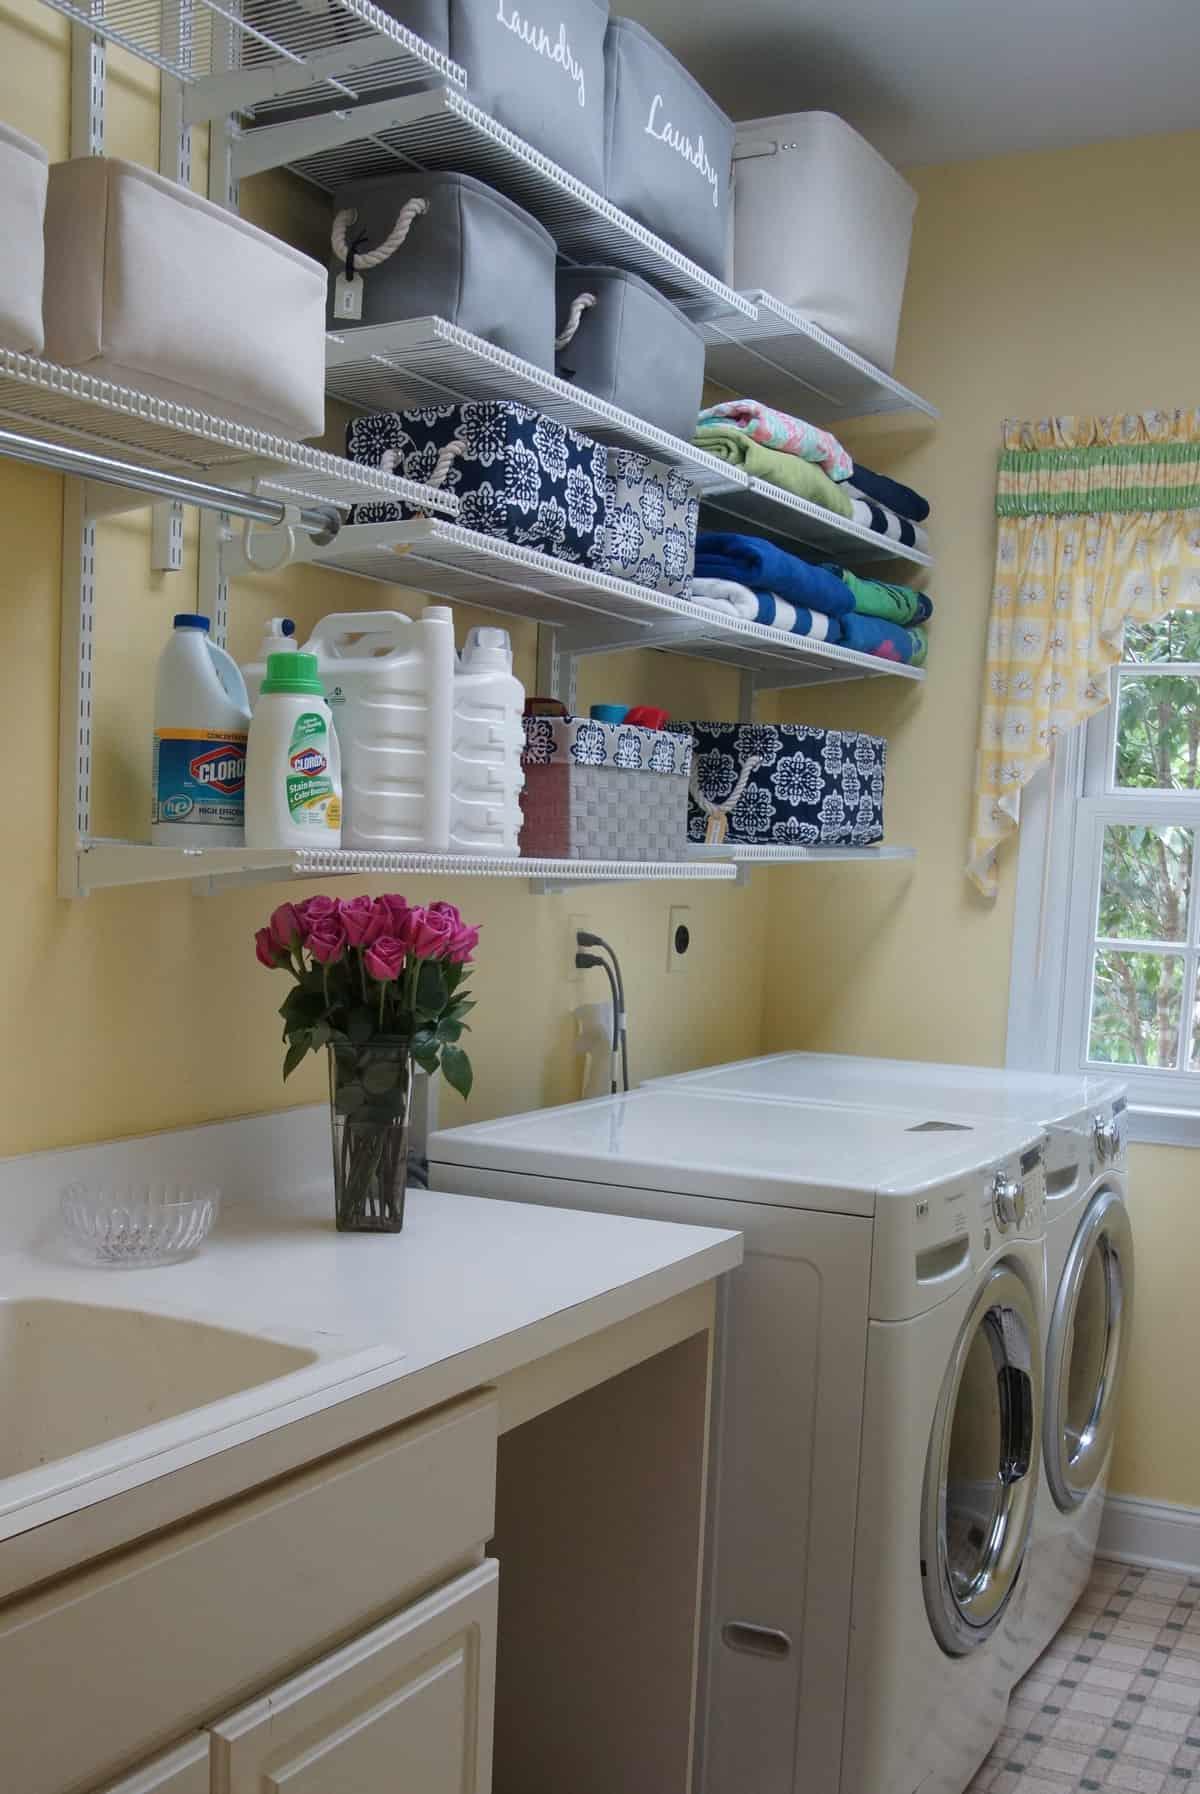 Maximize Laundry Room Storage and Organization | HeartWork ... on Laundry Room Organization Ideas  id=48232